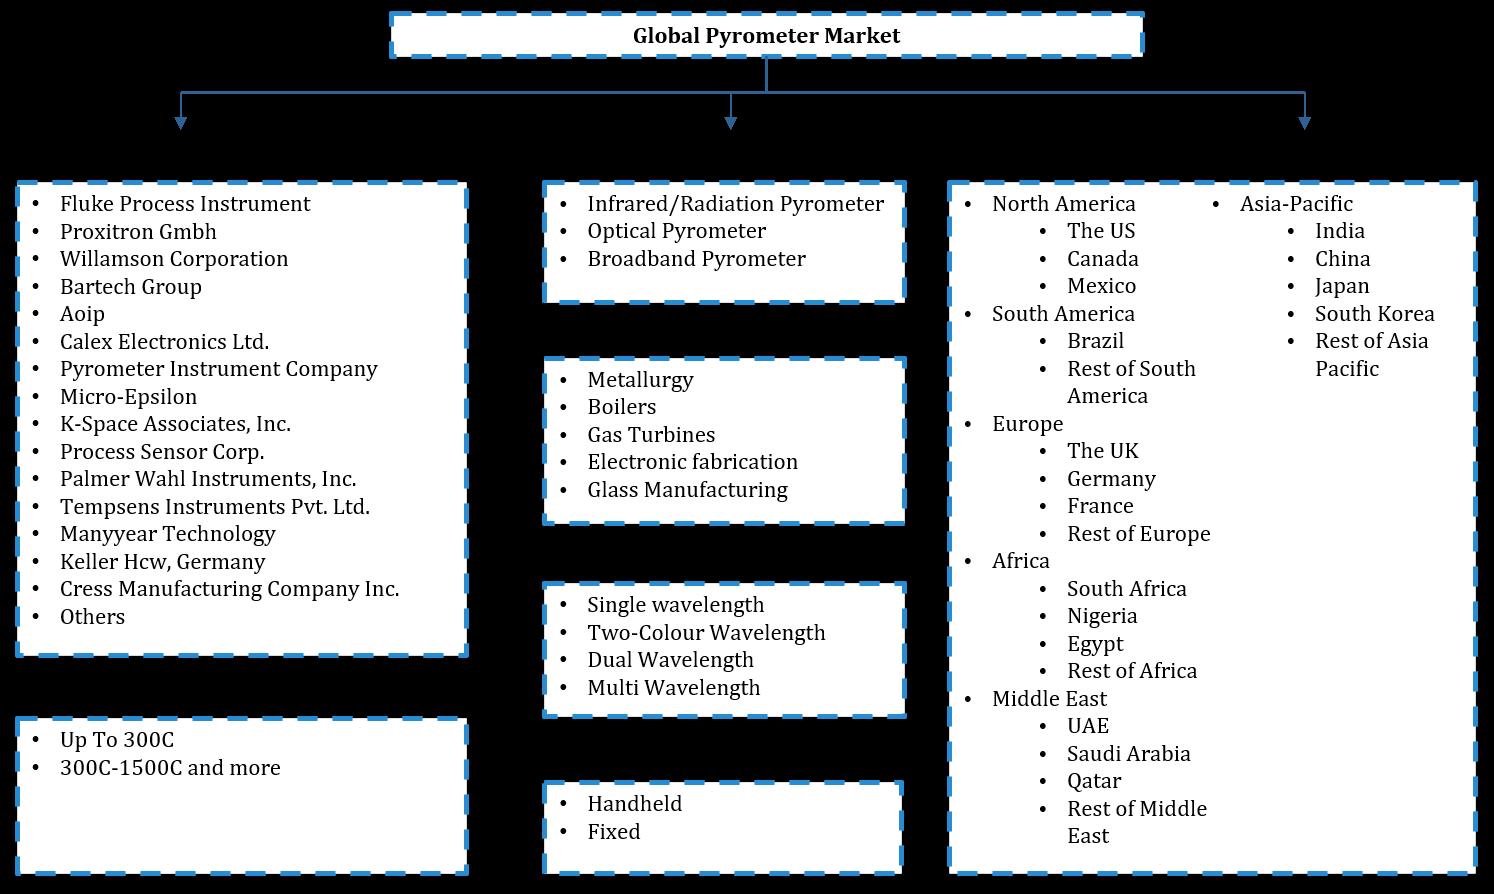 Global Pyrometer Market Segmentation